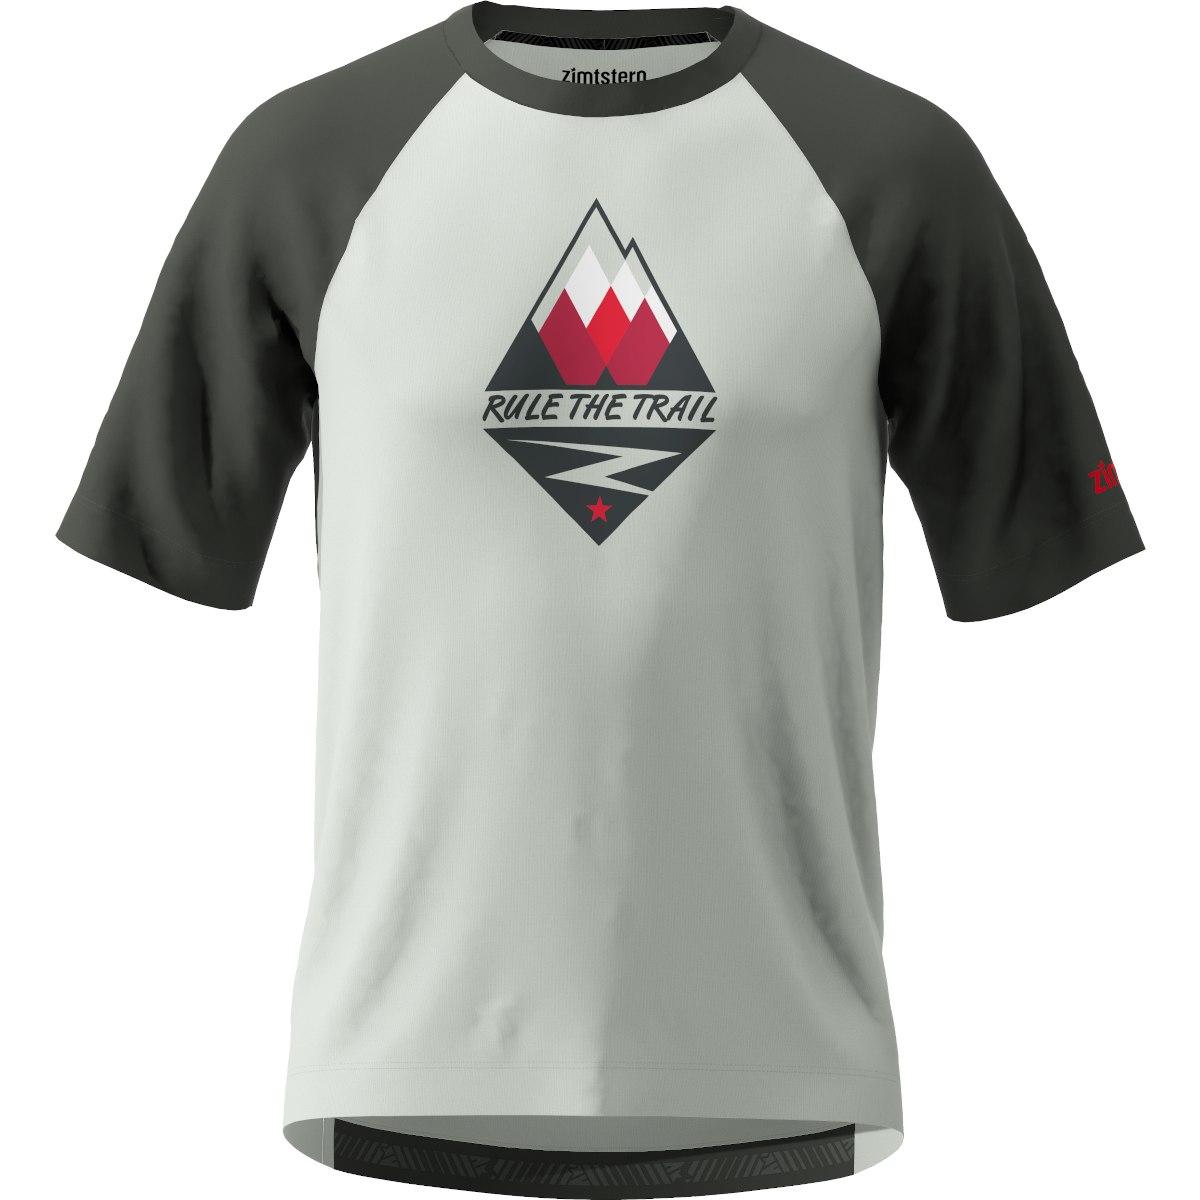 Zimtstern PureFlowz MTB Short Sleeve Shirt - glacier grey/gun metal/cyber red